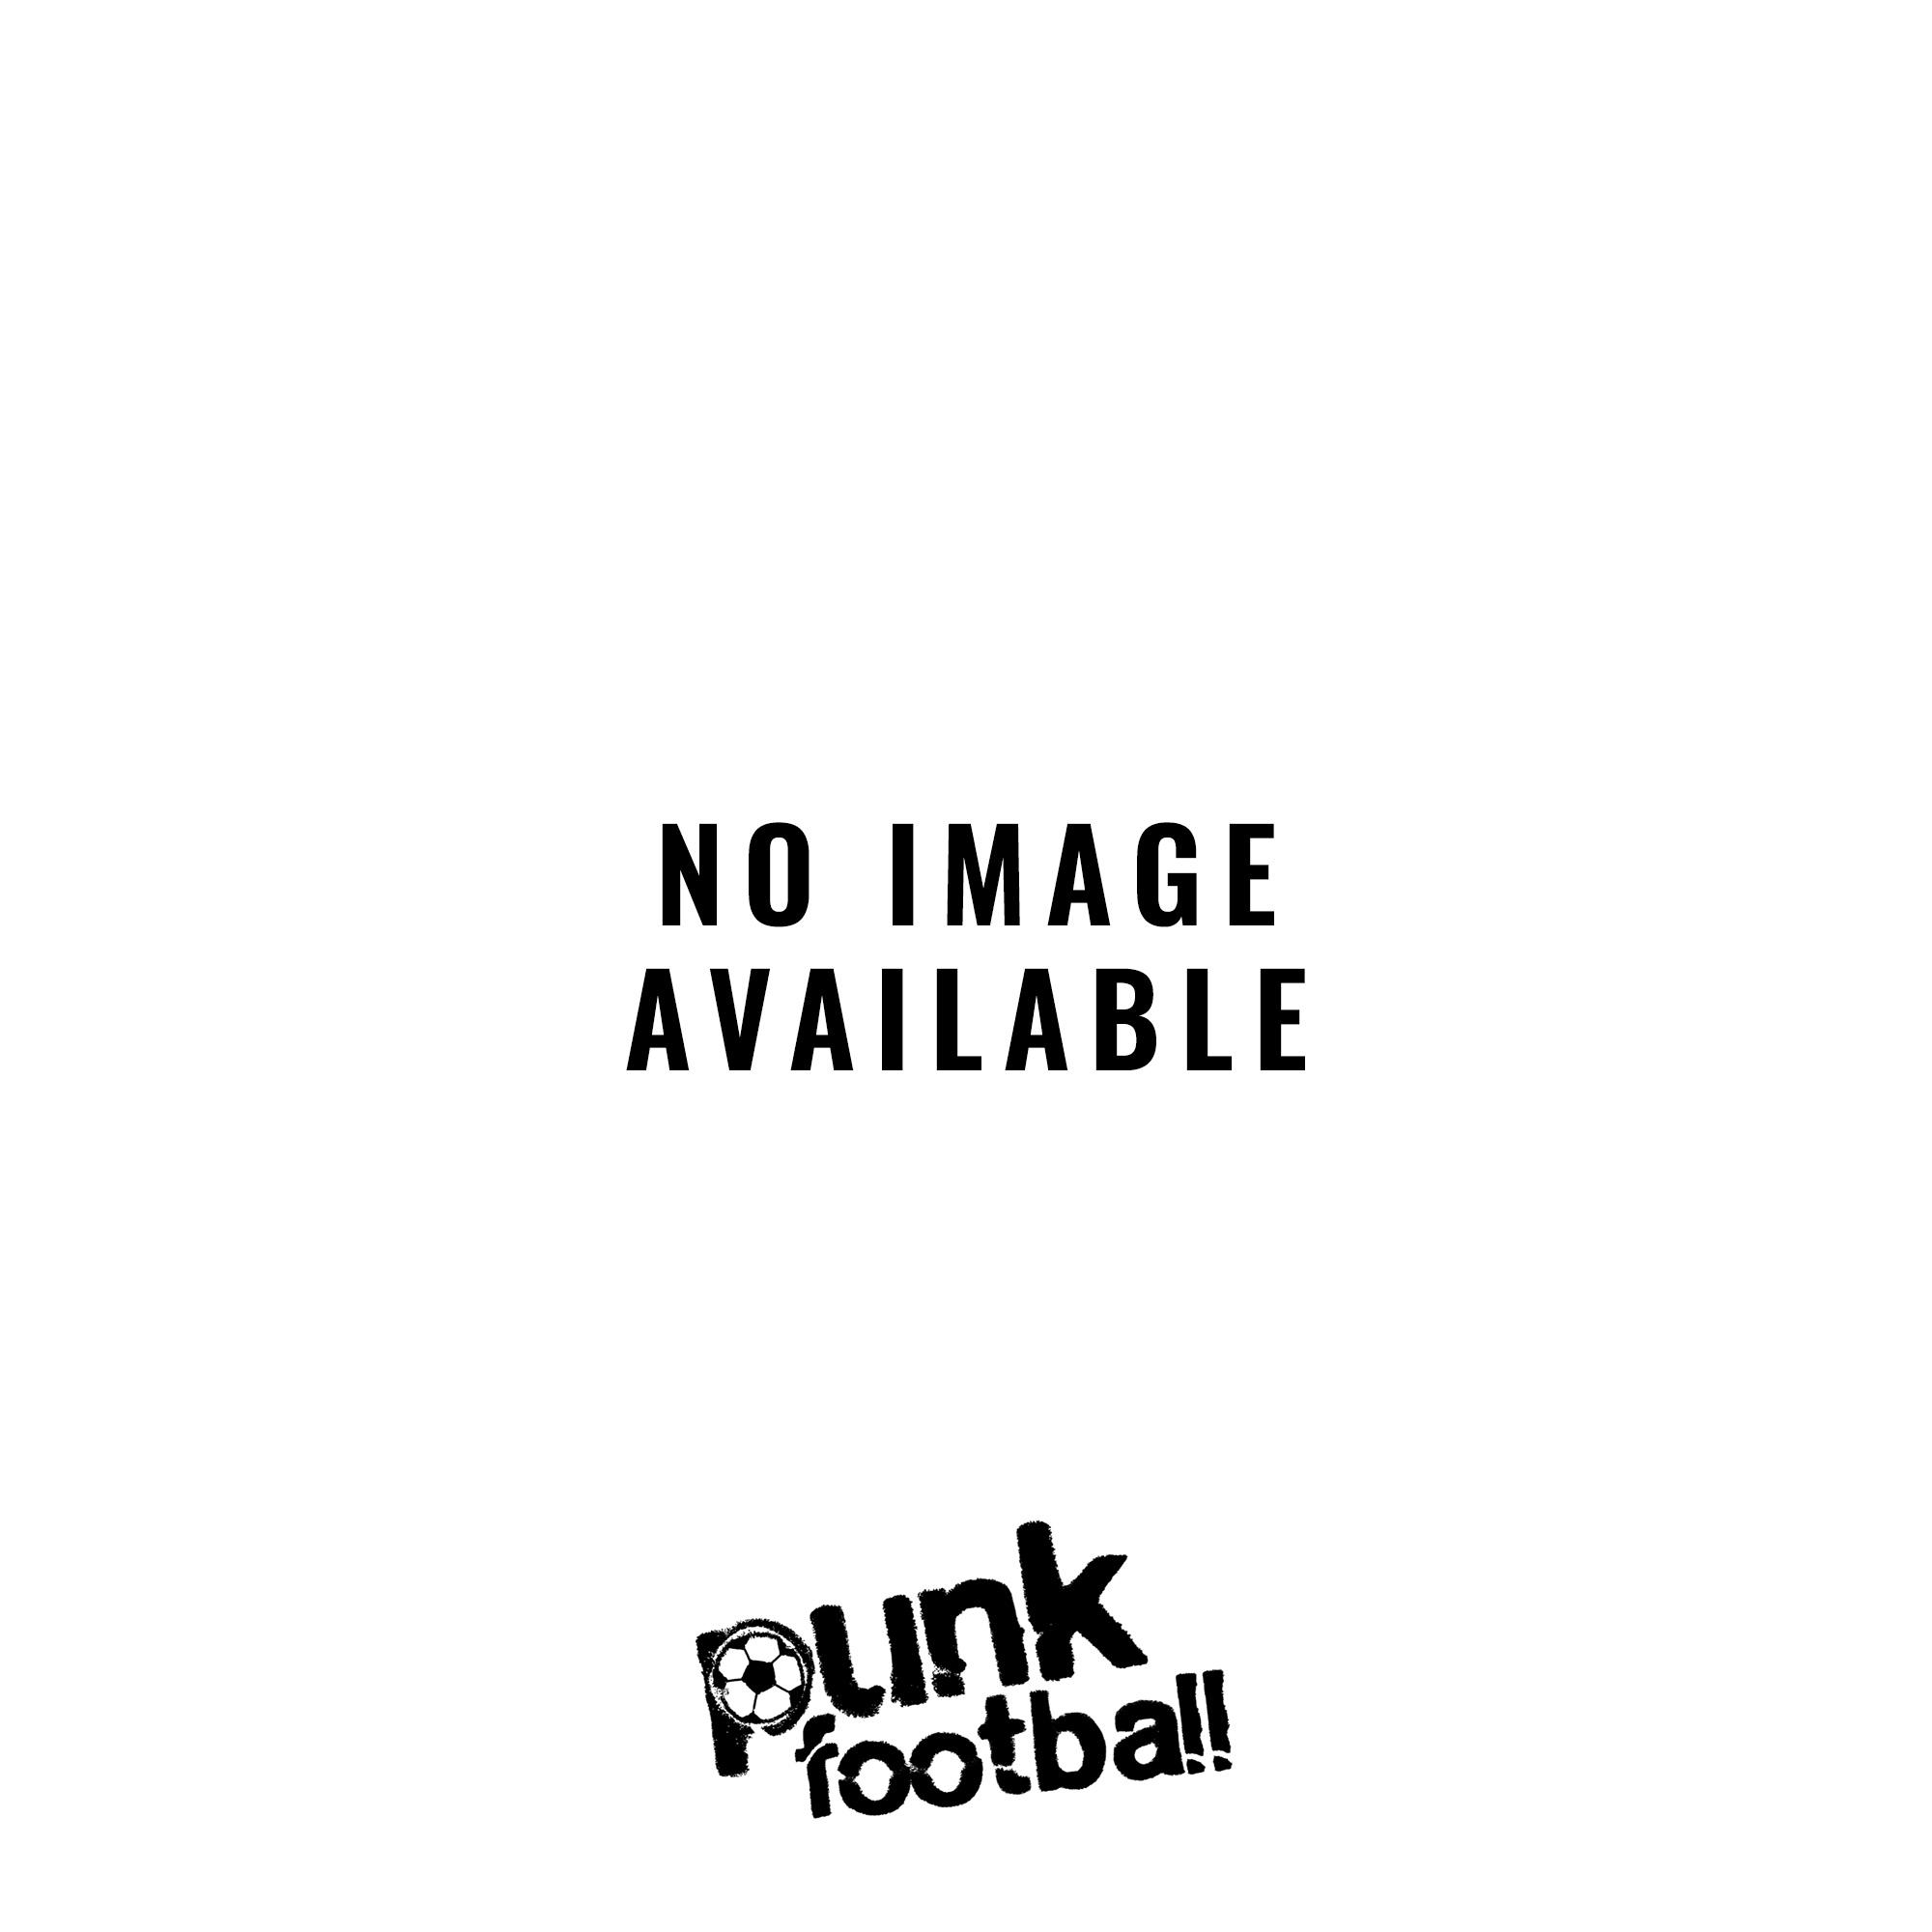 East of England (Peterborough United) Hooded Sweatshirt